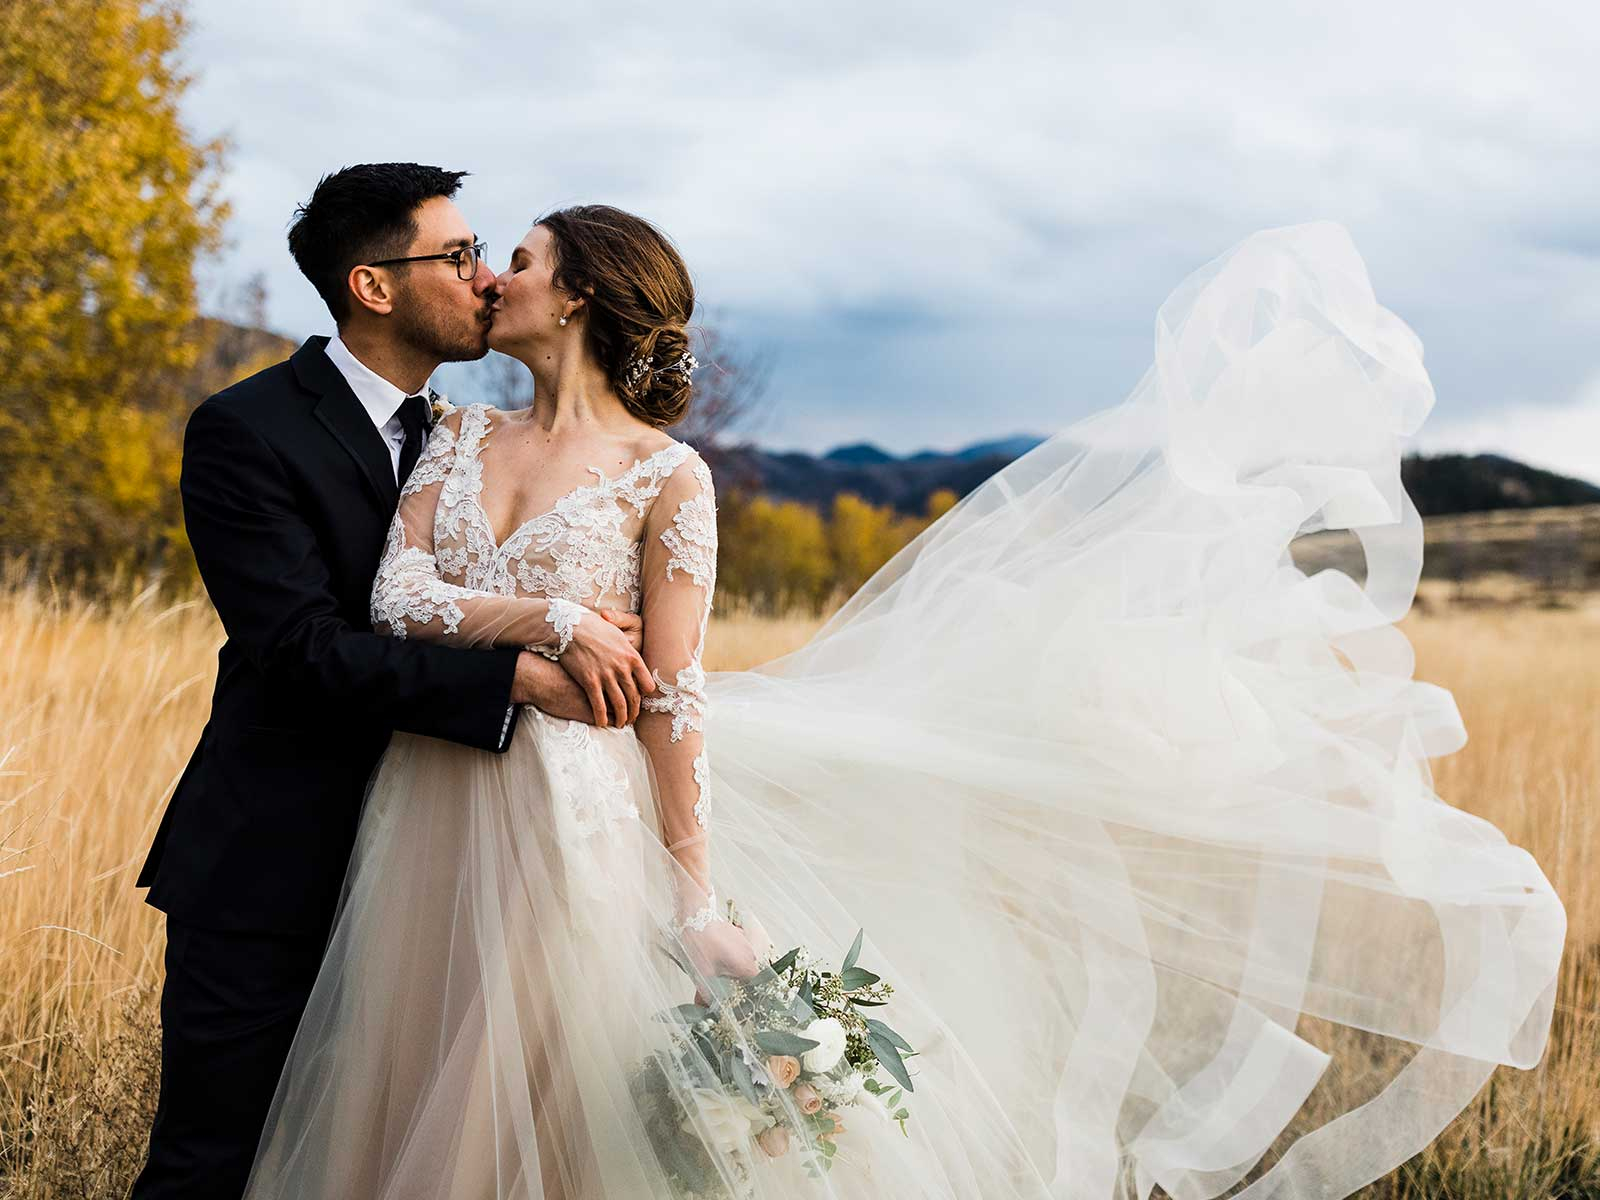 kristen jon wedding fluffy dress